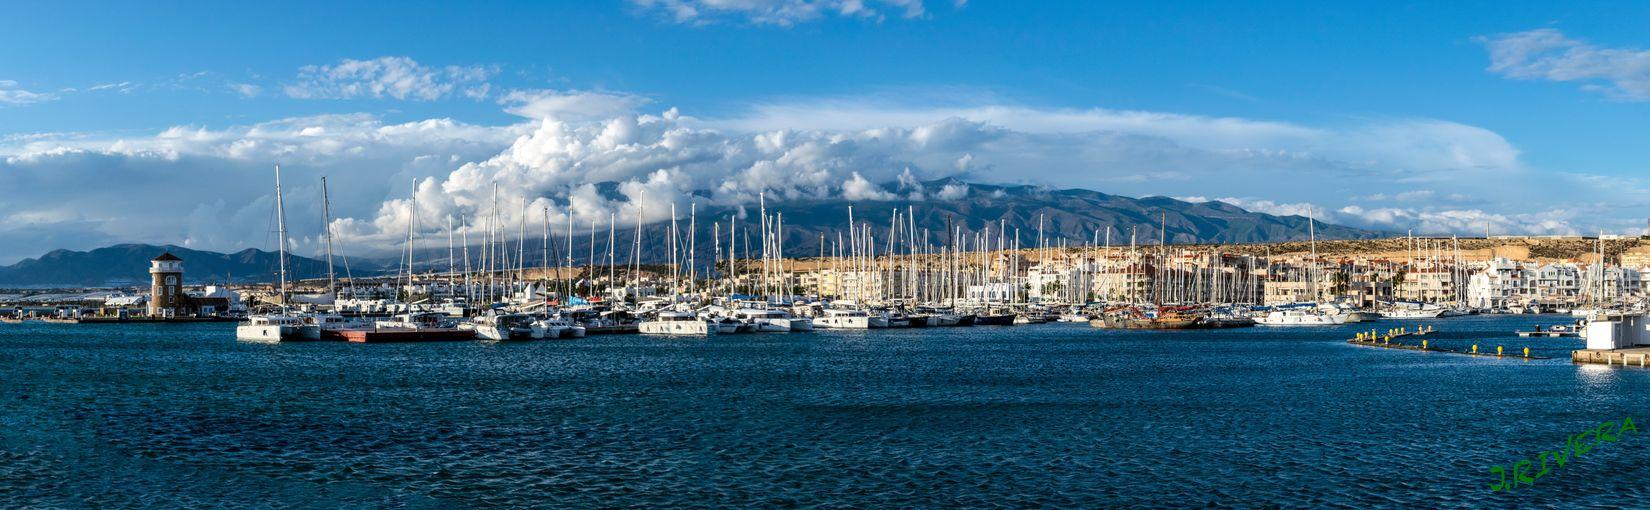 EyeEm Selects Nautical Vessel Water Sky Transportation Cloud - Sky Mode Of Transportation